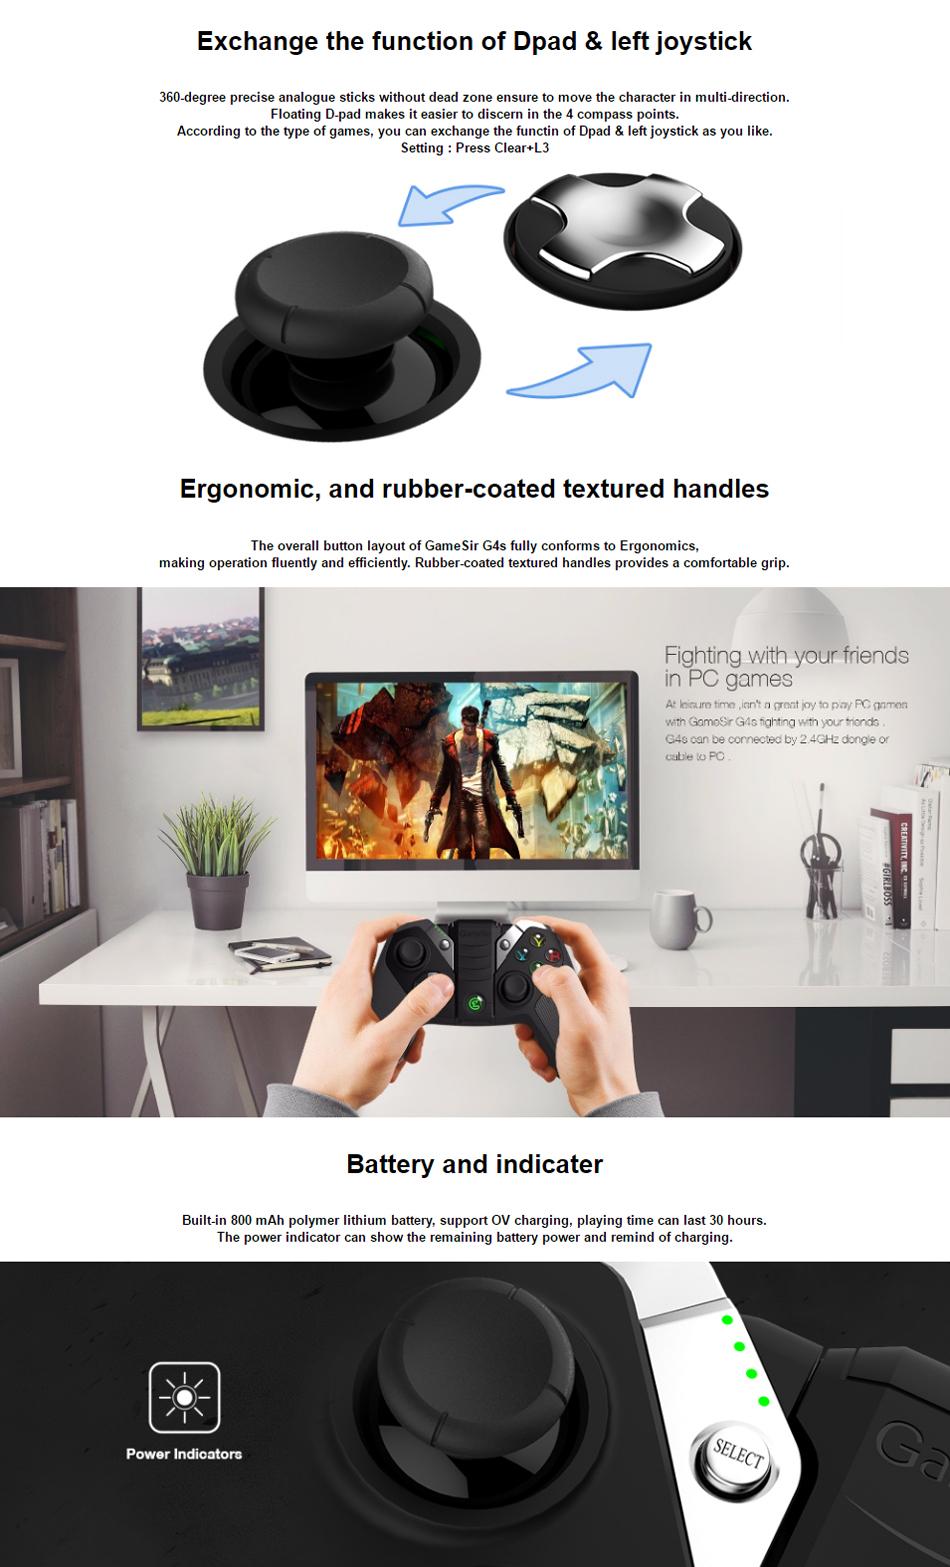 GameSir G4S Bluetooth 2.4G Wireless USB Wired Gamepad Game Controller Joystick